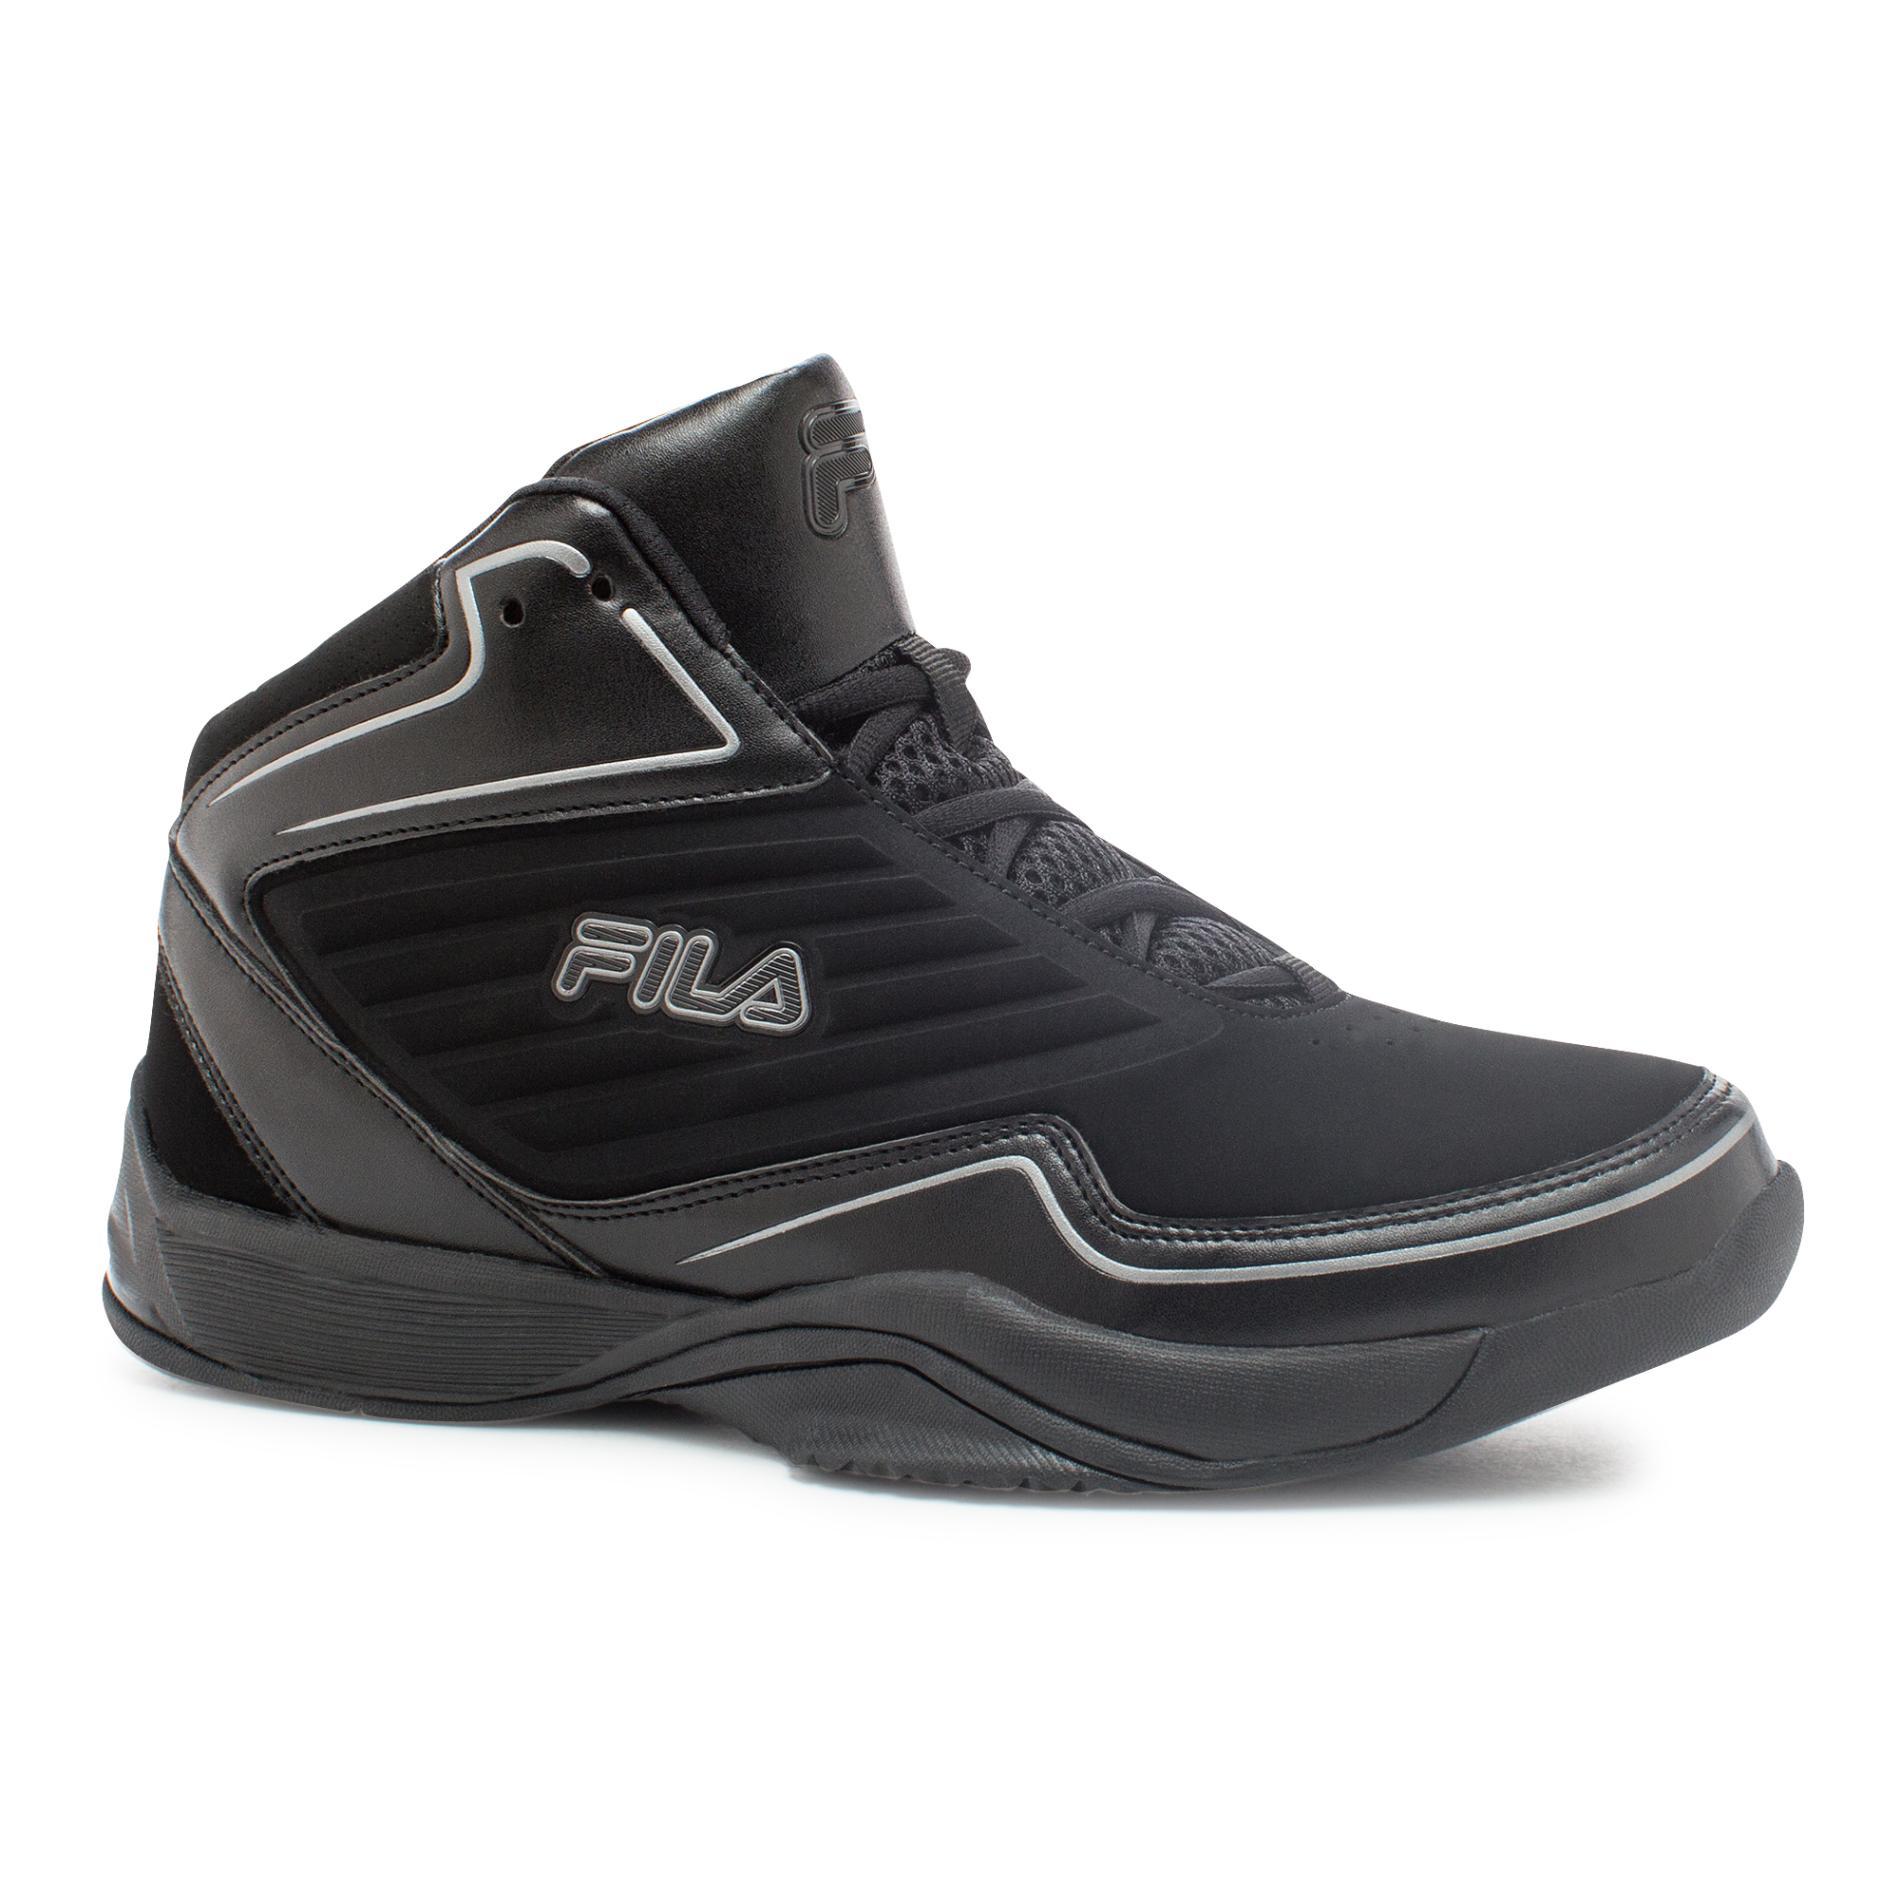 Fila Boy's Black Import High-Top Athletic Shoe PartNumber: 036VA94856512P MfgPartNumber: 3SB10300